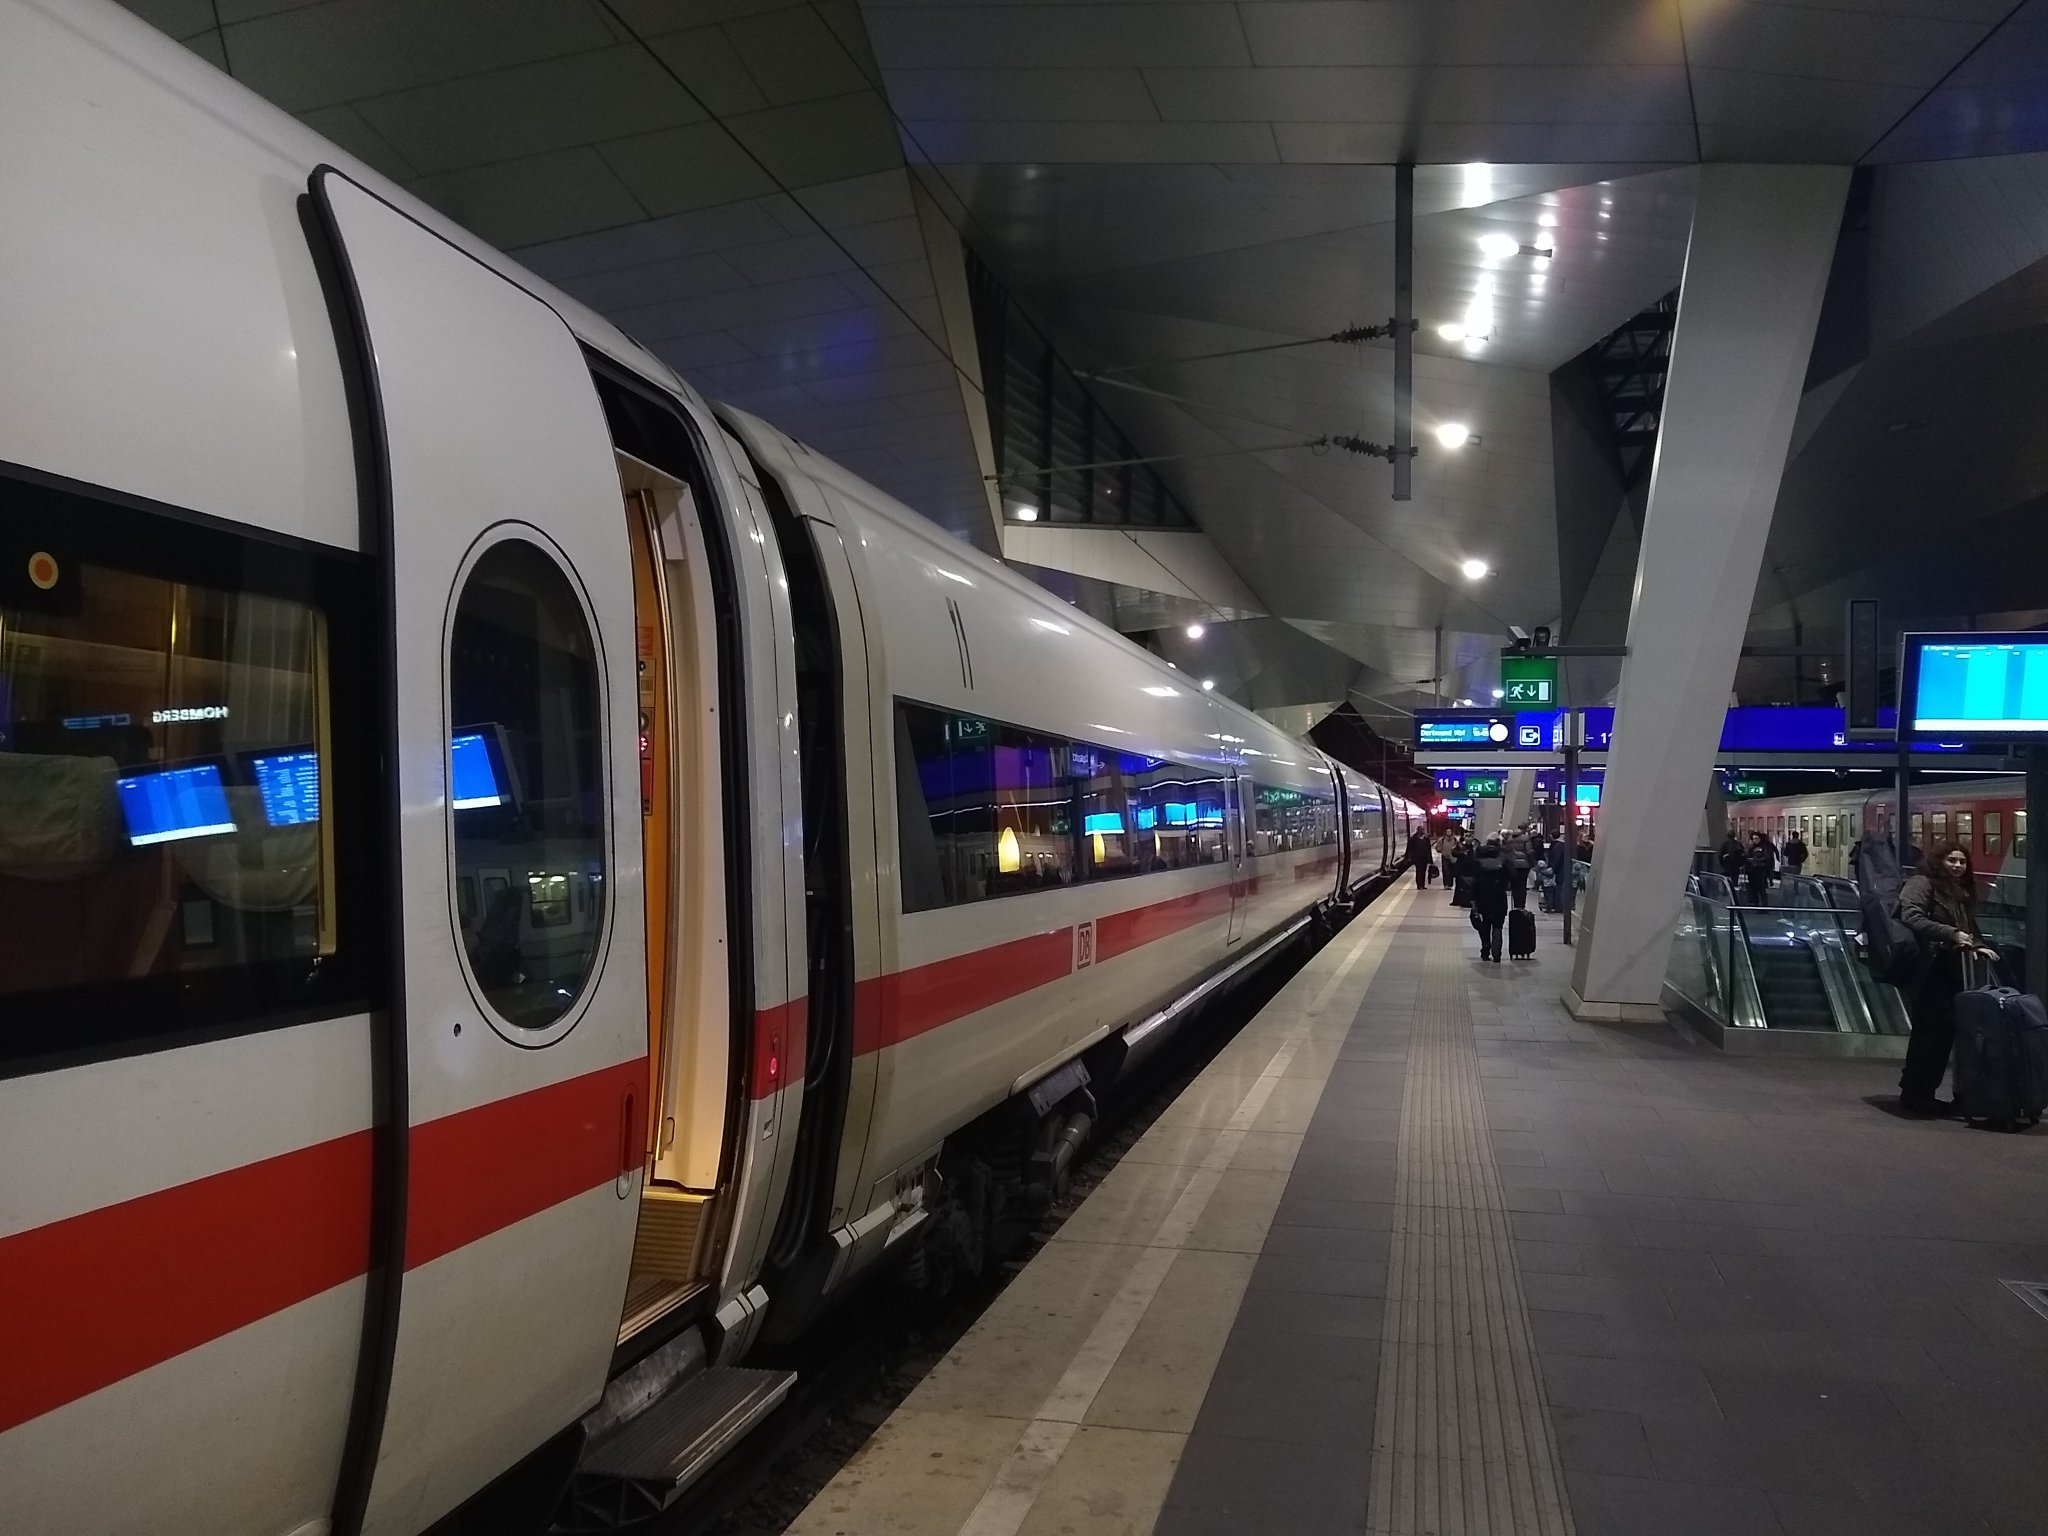 The ICE train at platform 11